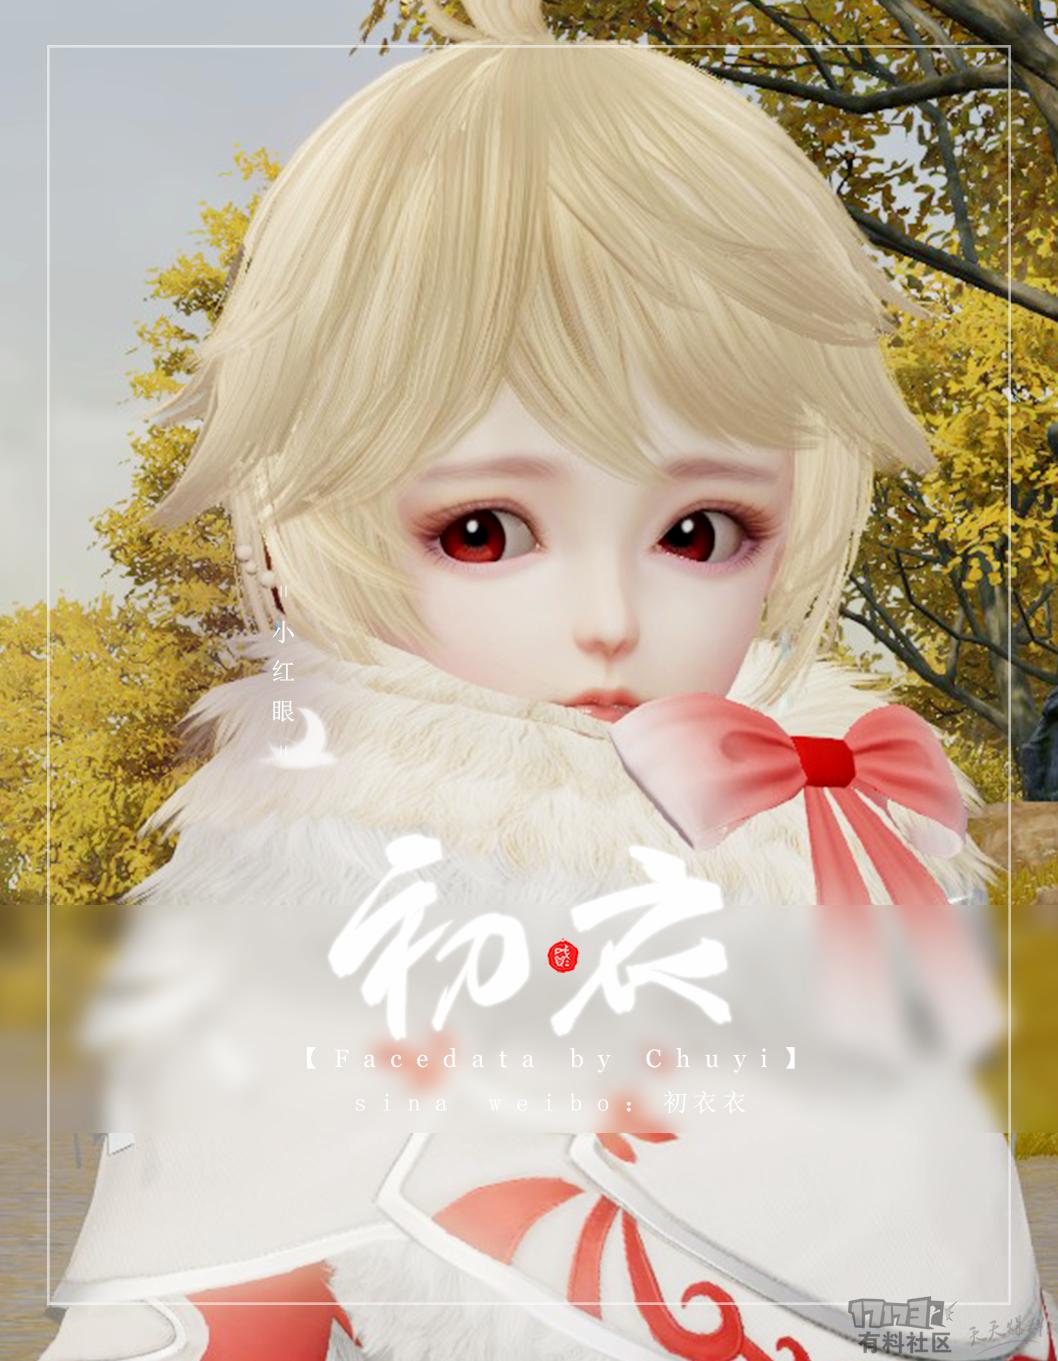 初衣-小红眼3.png